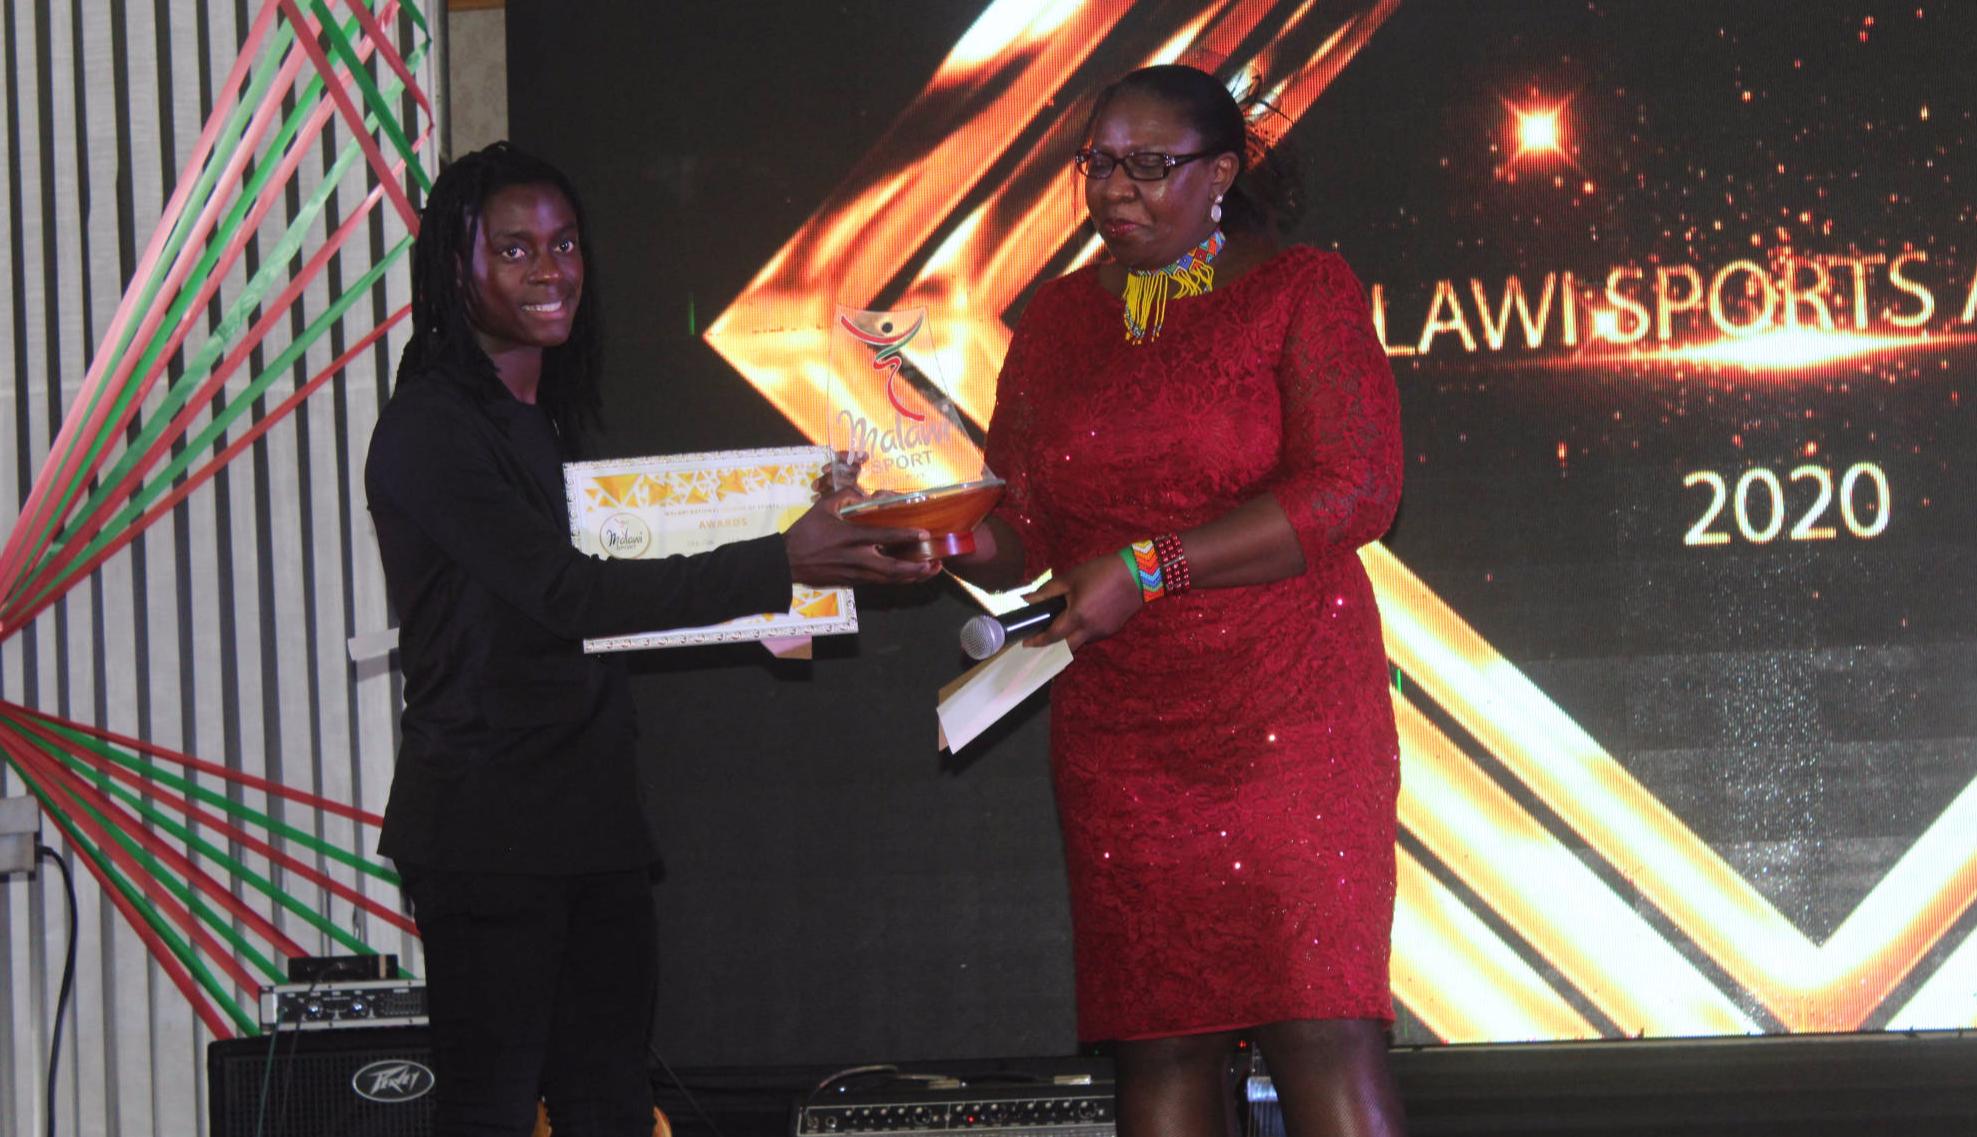 Malawi Sports 2020 Awards